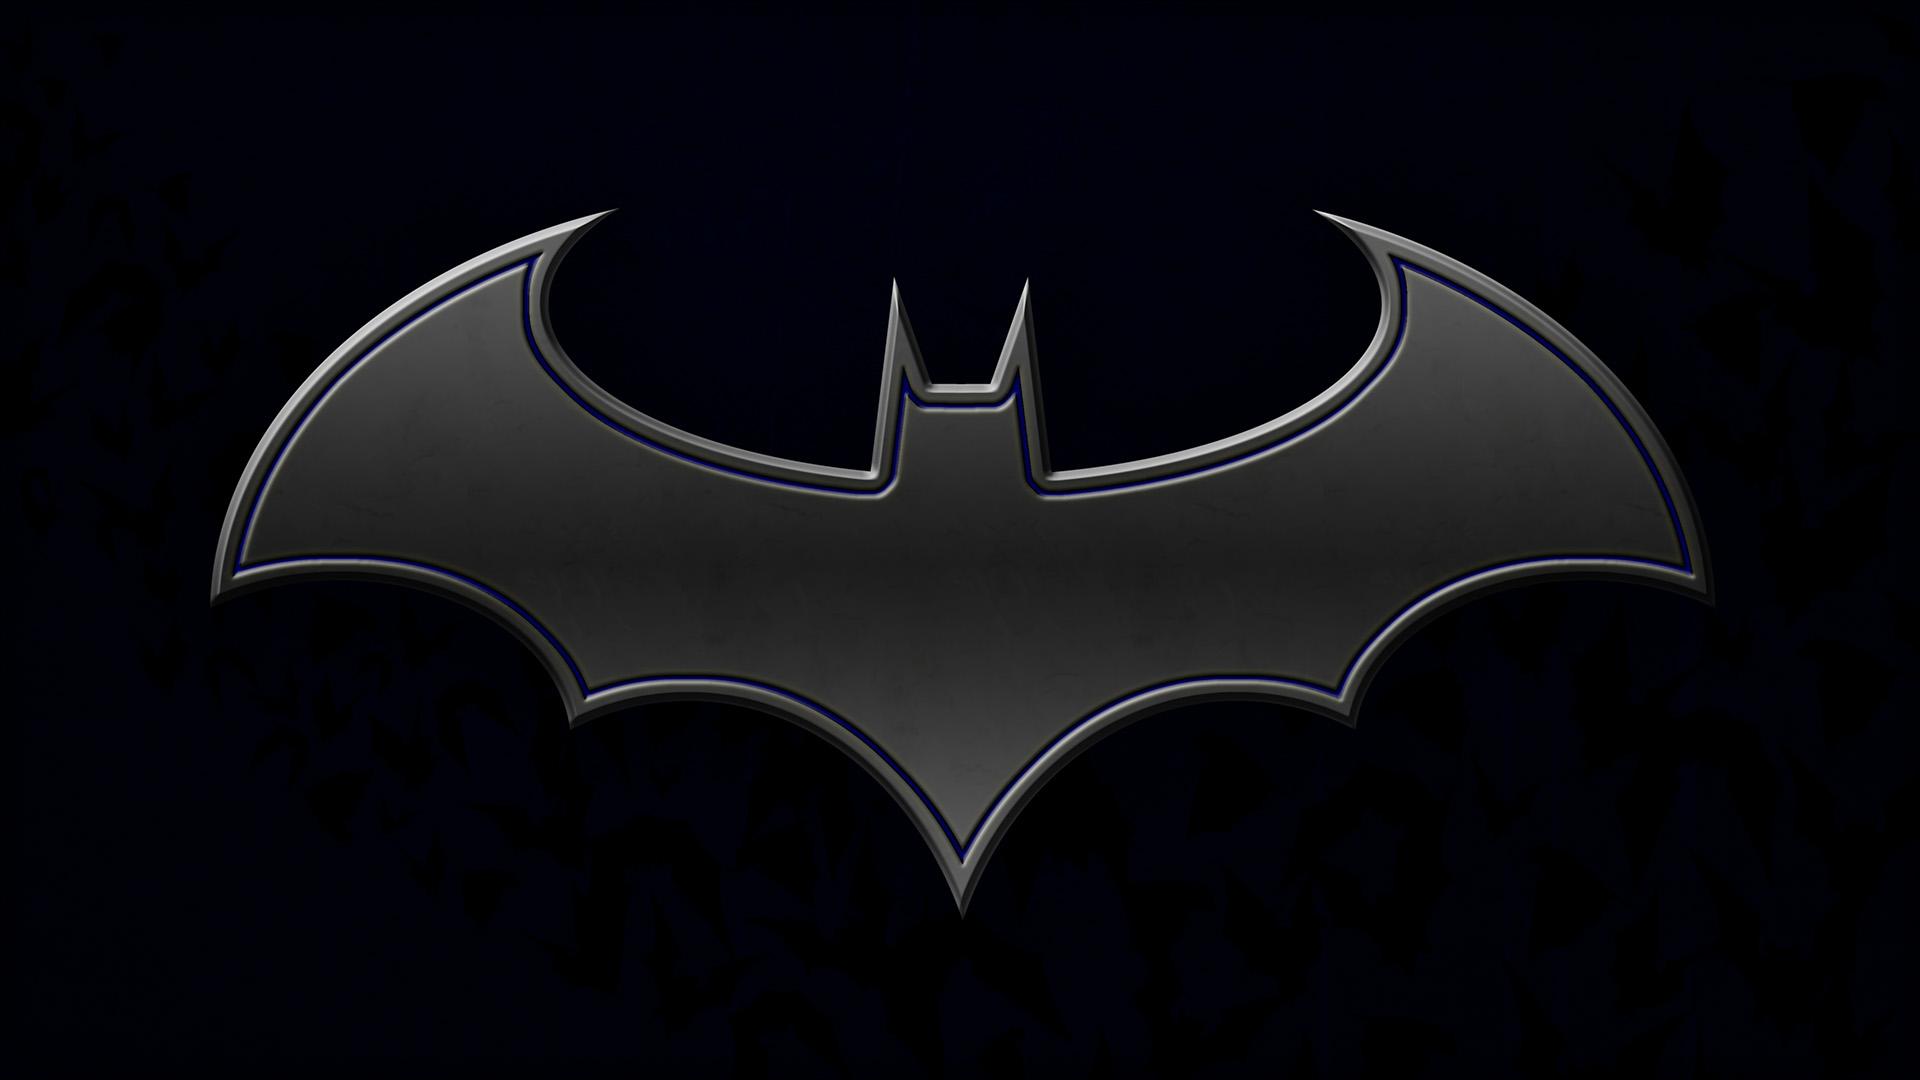 47+] Cool Batman Logo Wallpaper on WallpaperSafari.